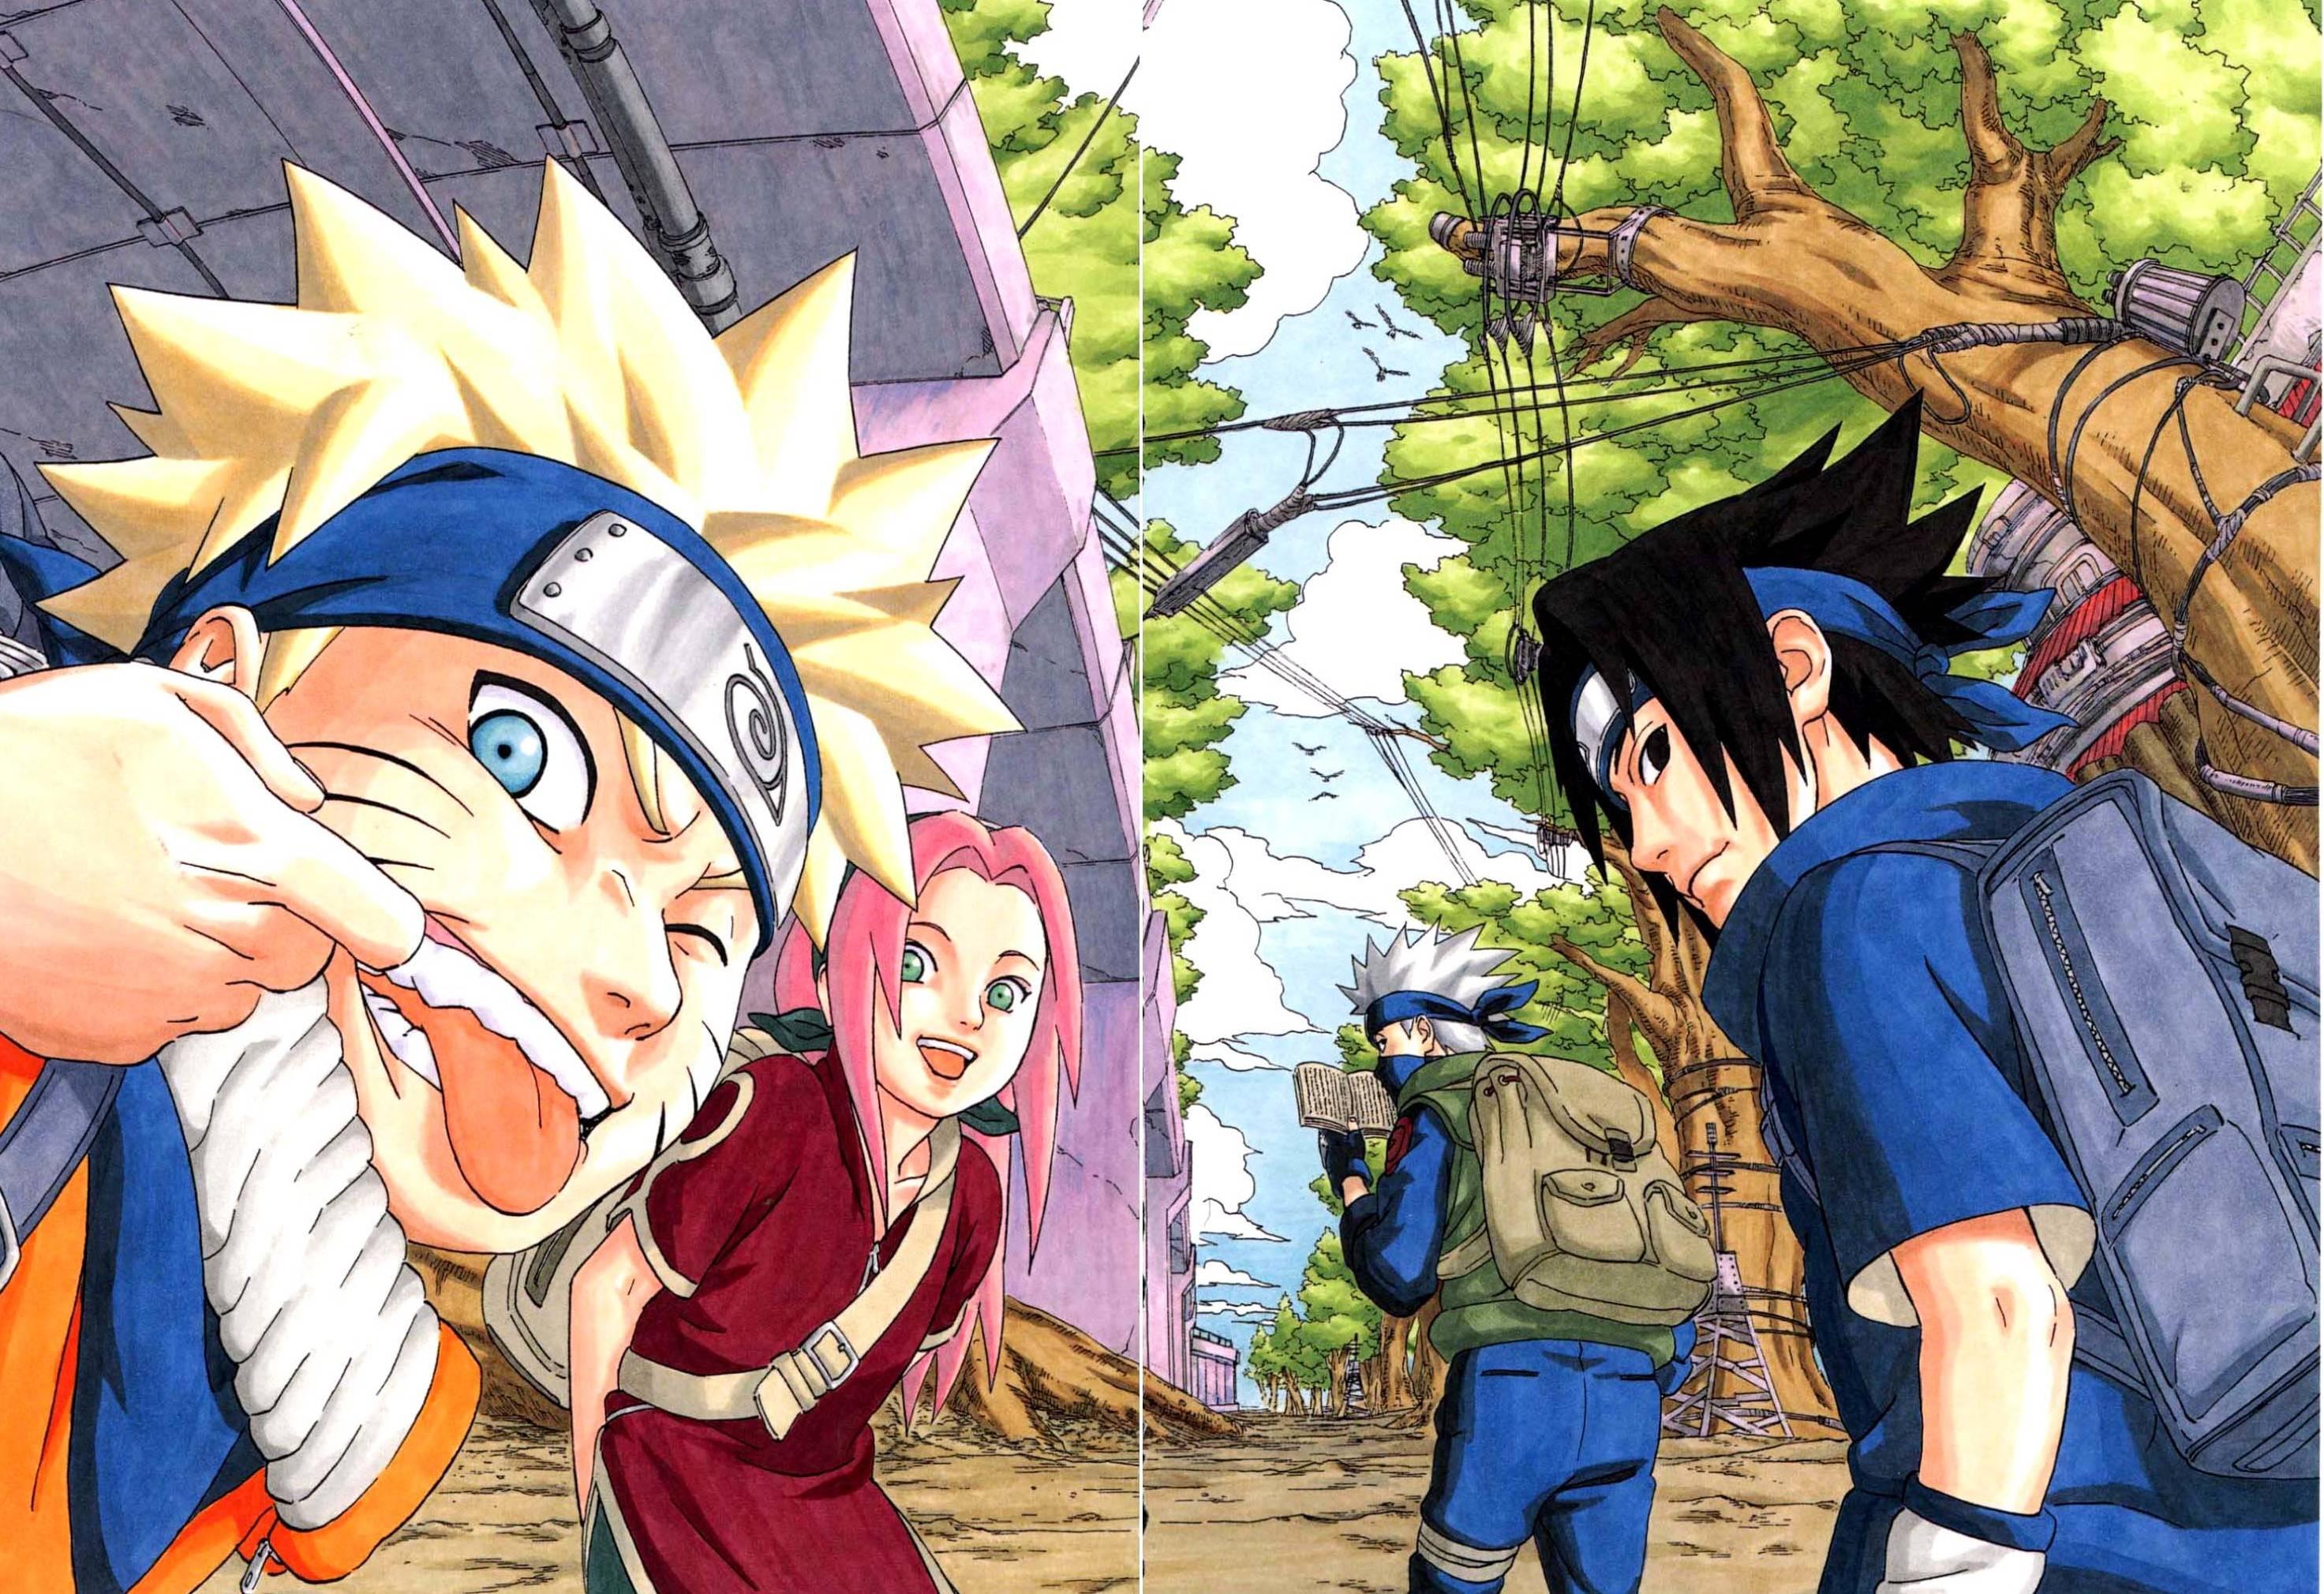 Cool Naruto Wallpapers - Wallpaper Cave